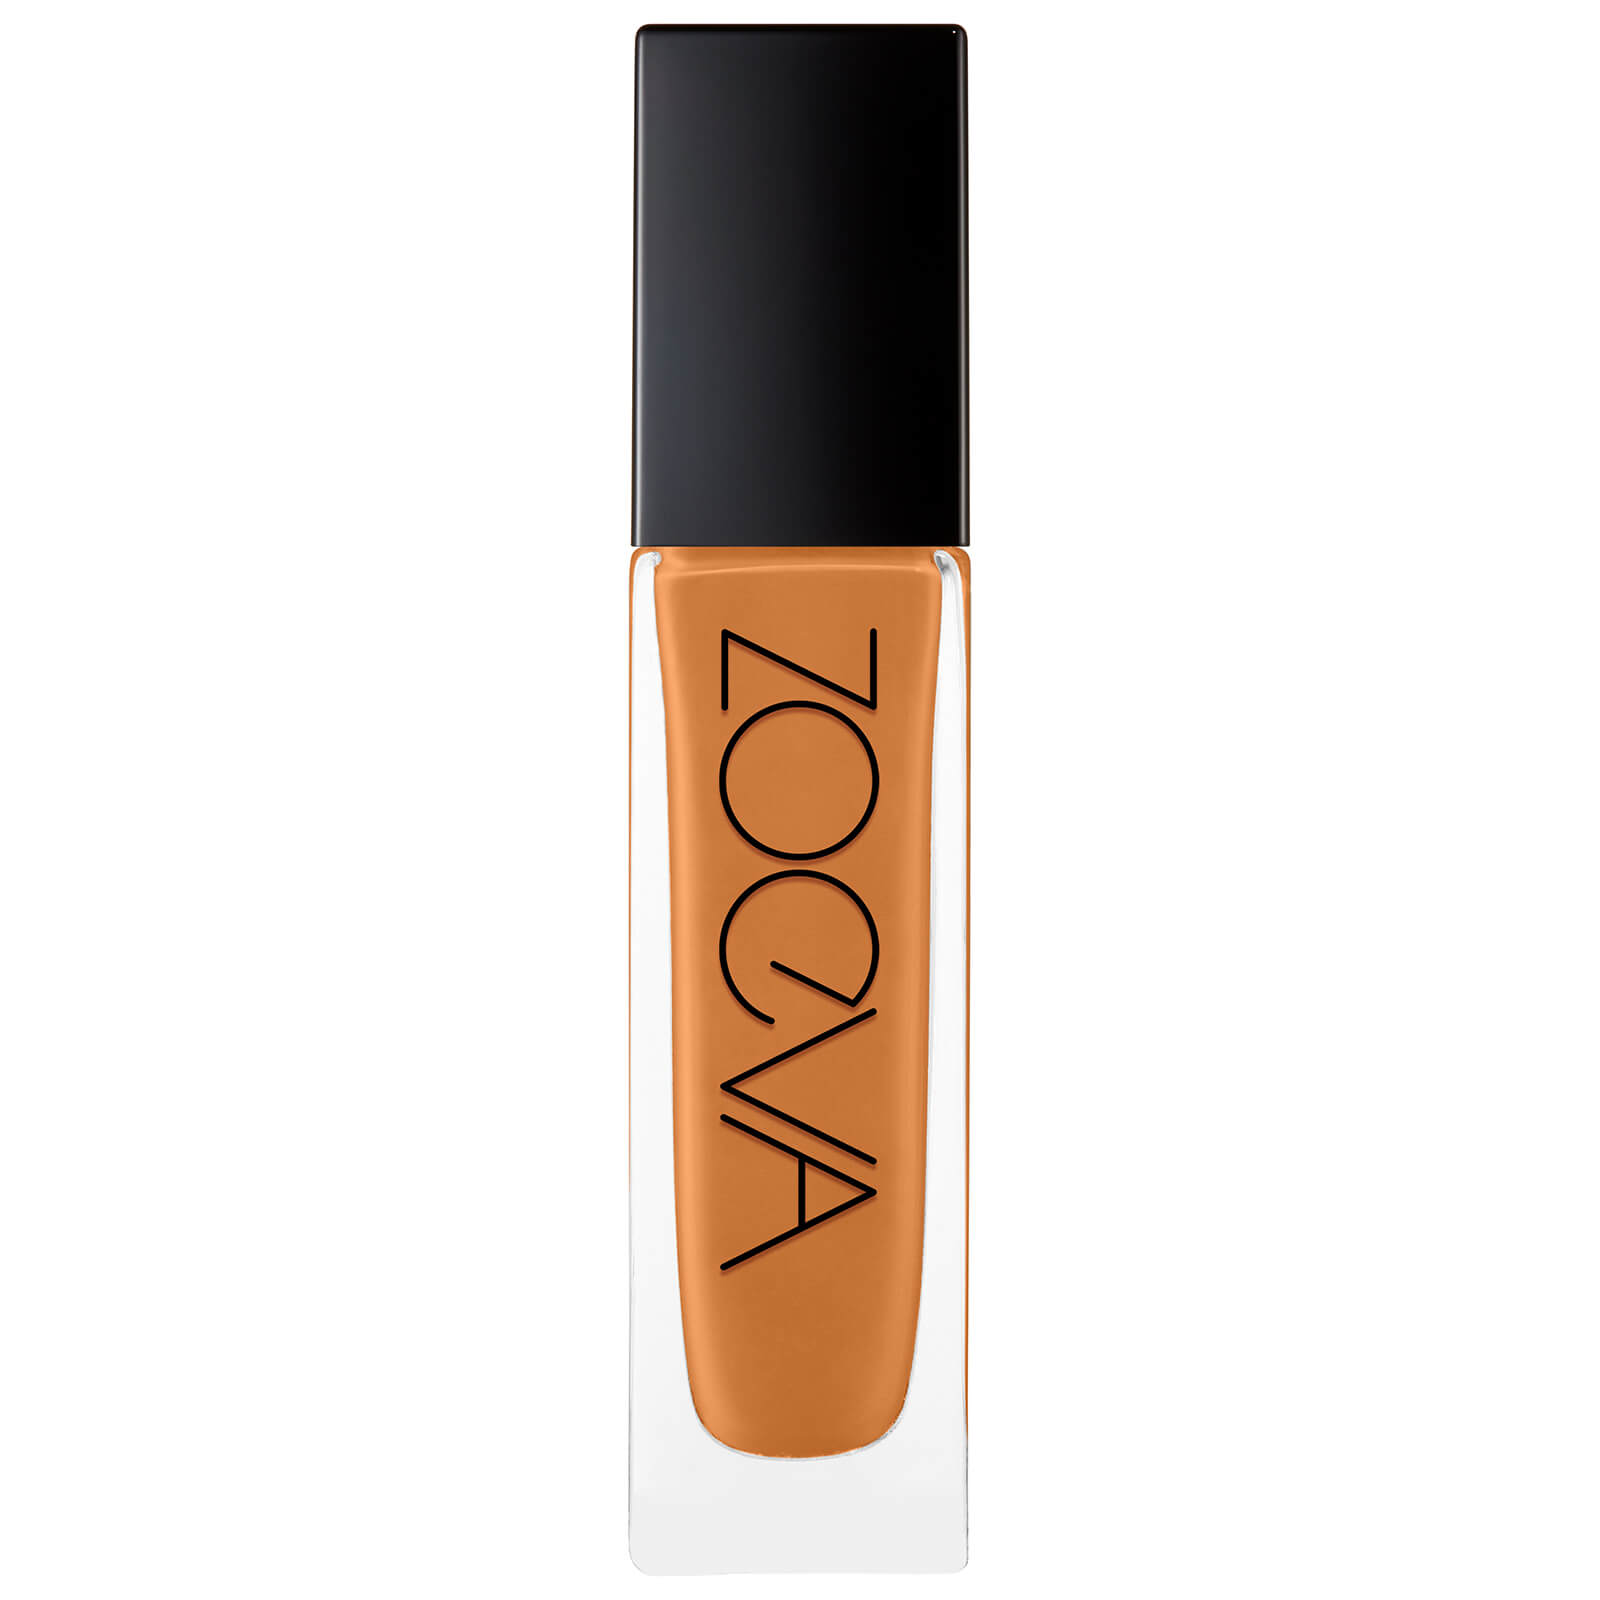 ZOEVA Authentik Skin Foundation 30ml (Various Shades) - 290W Intuitive